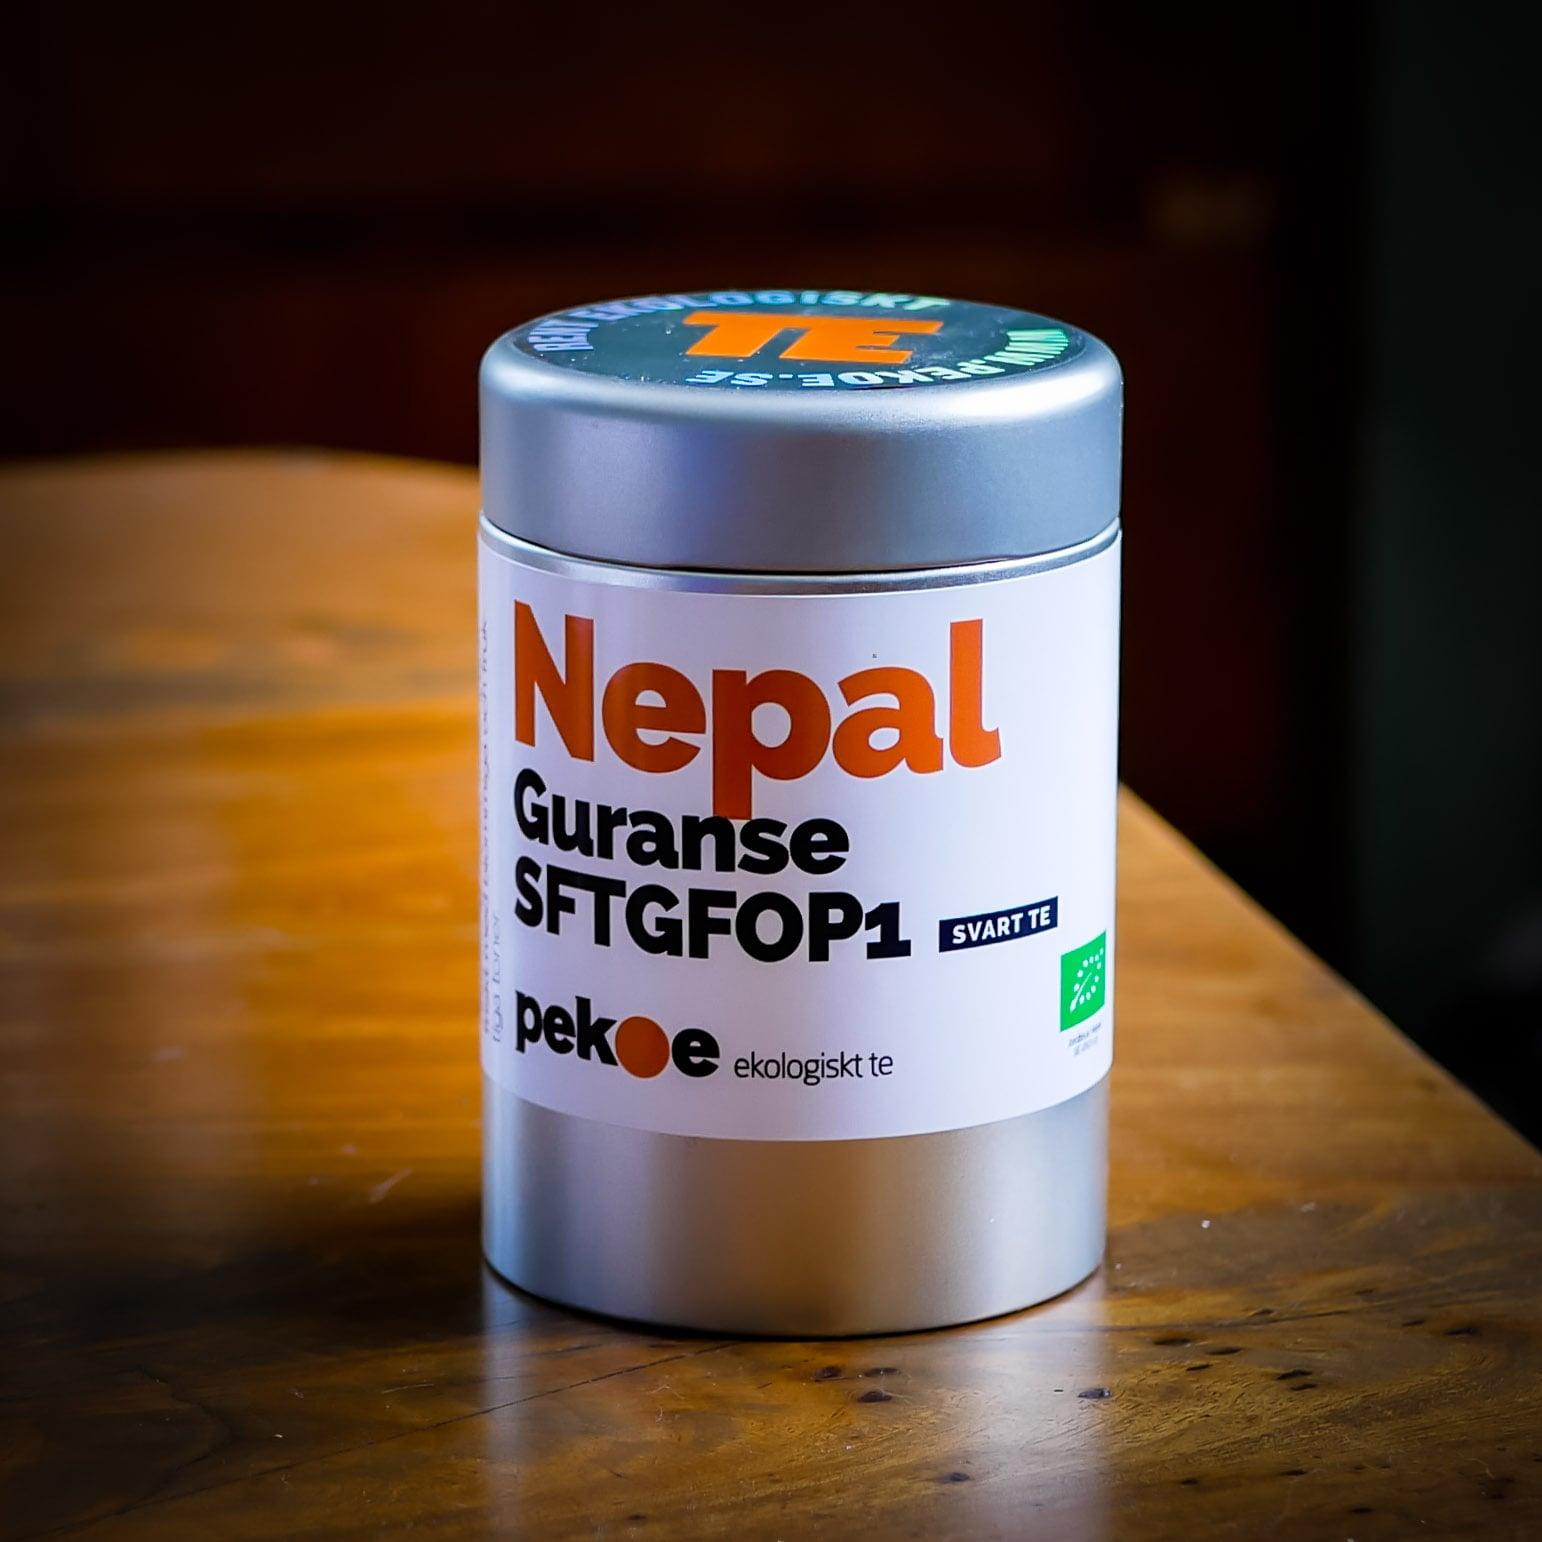 ekologiskt te från Nepal i plåtburk